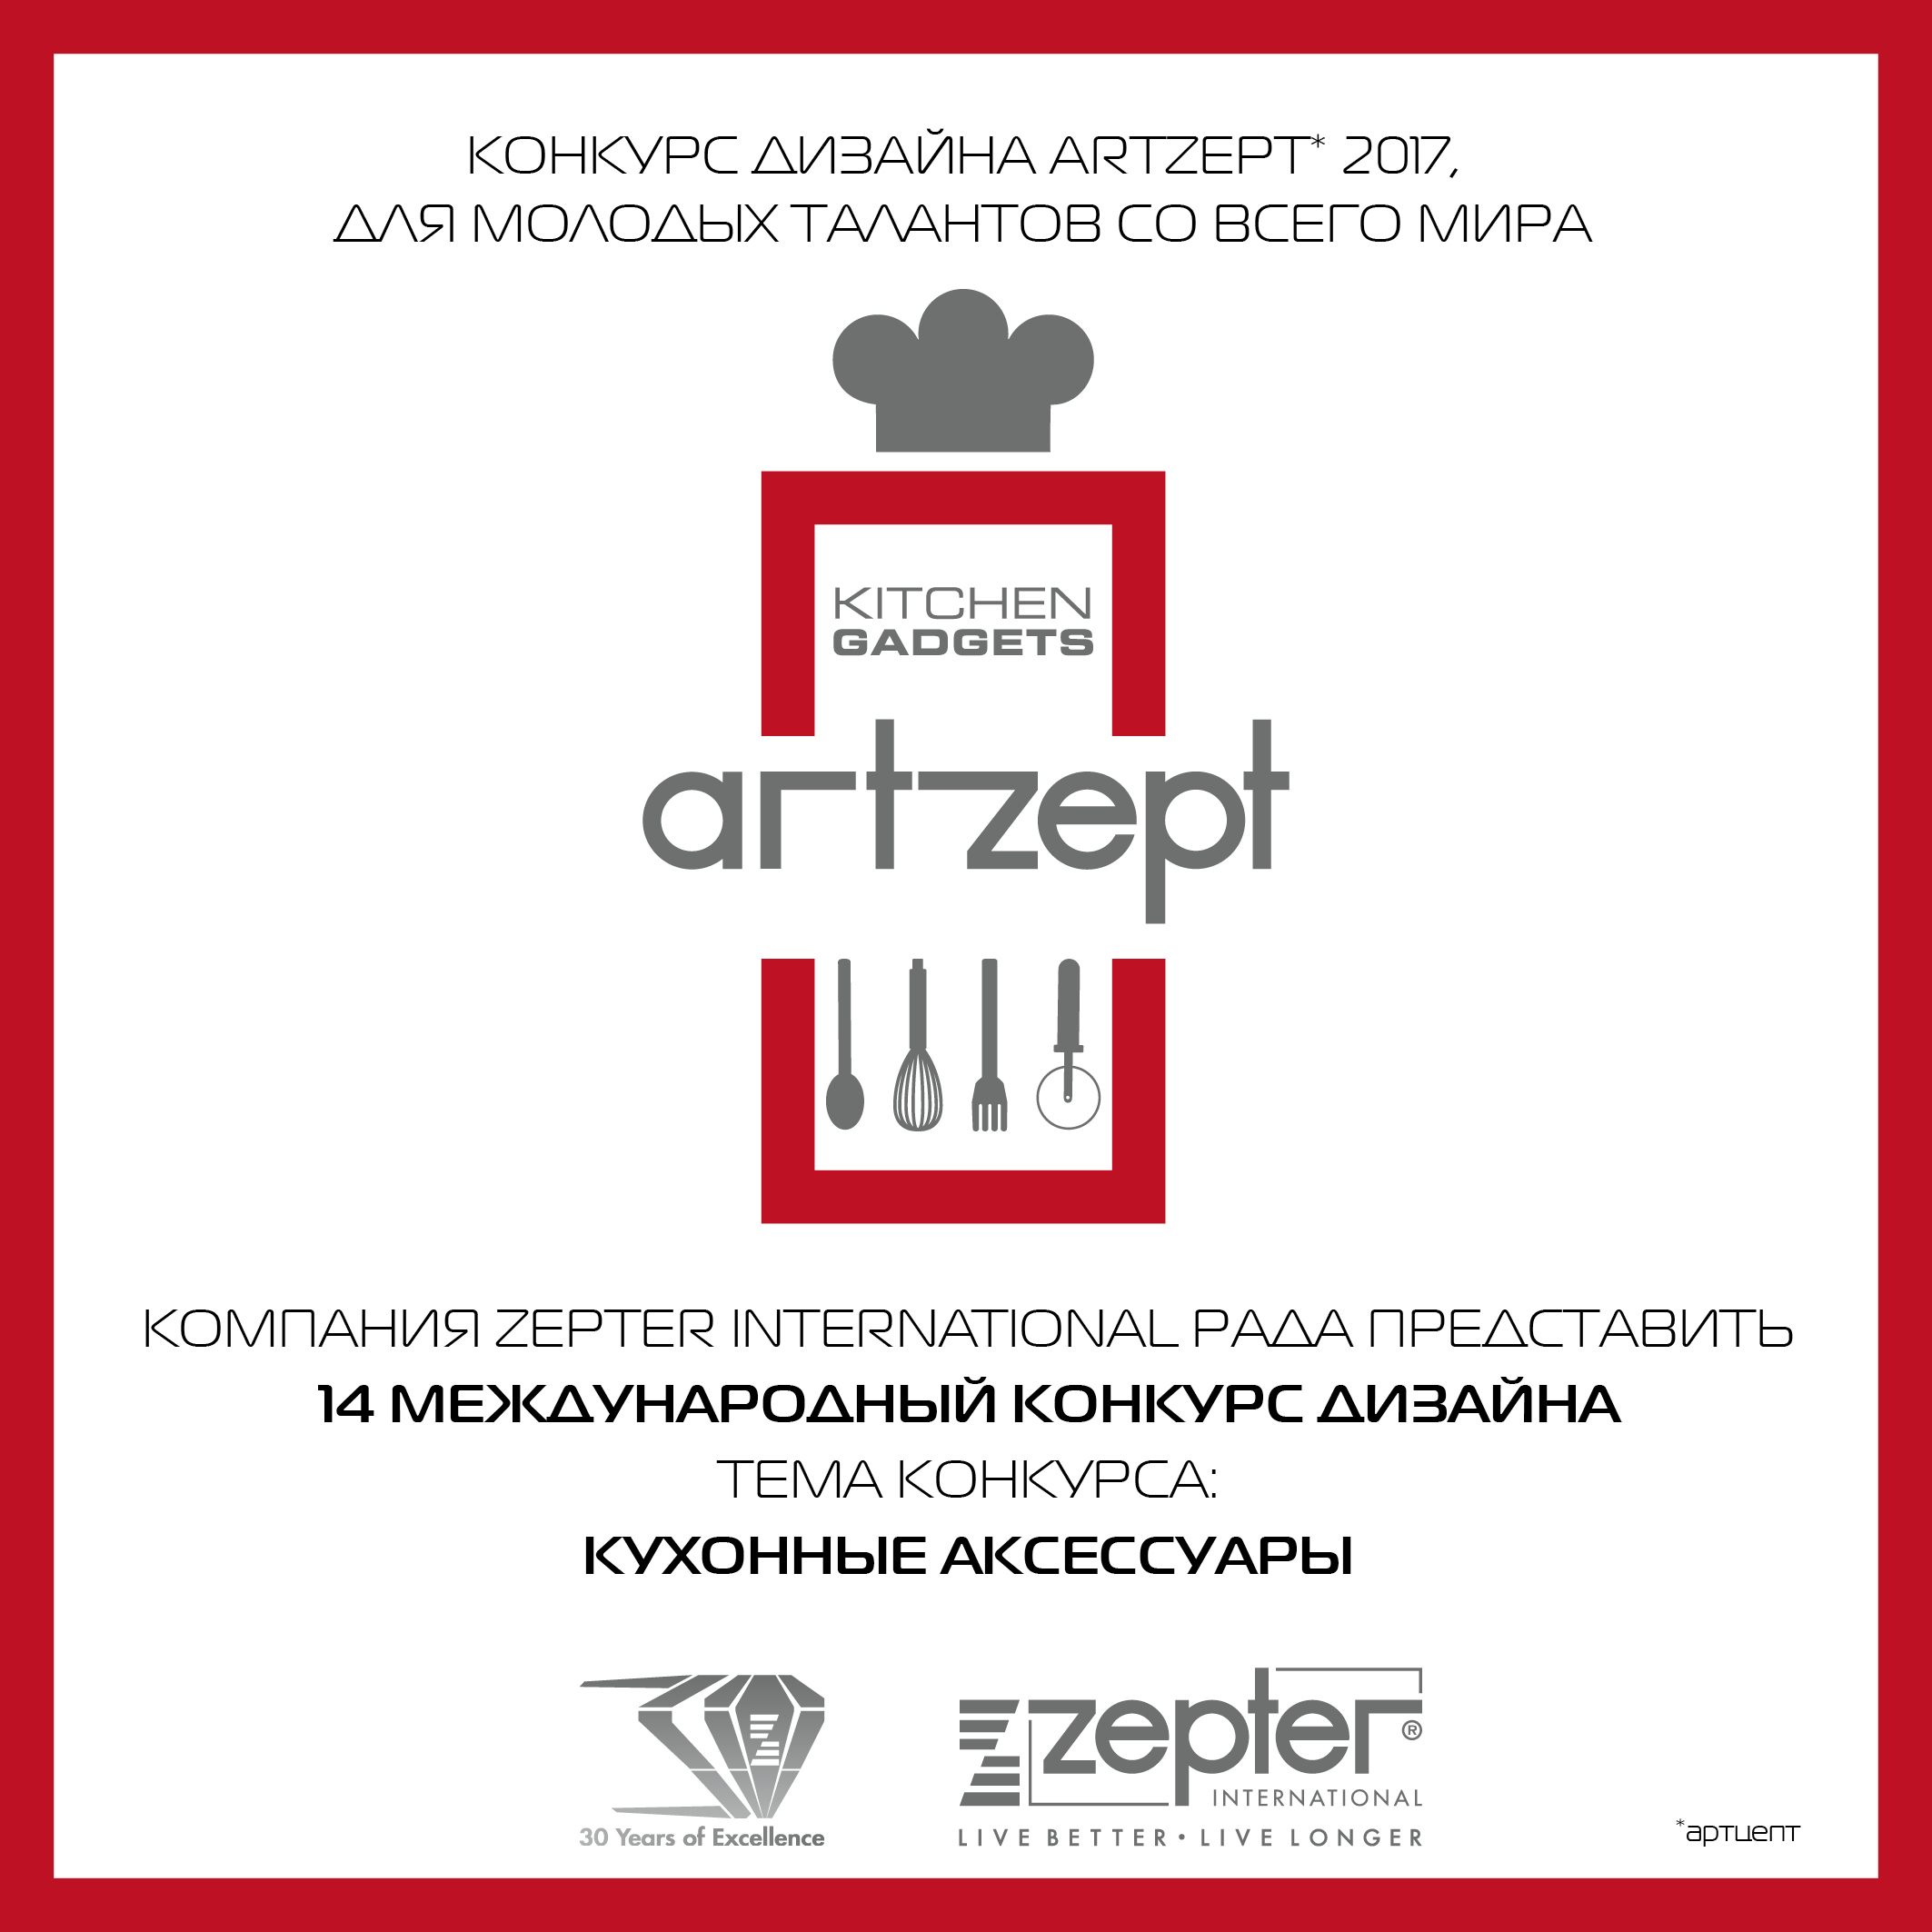 artzept_leaflet_RU_20170502